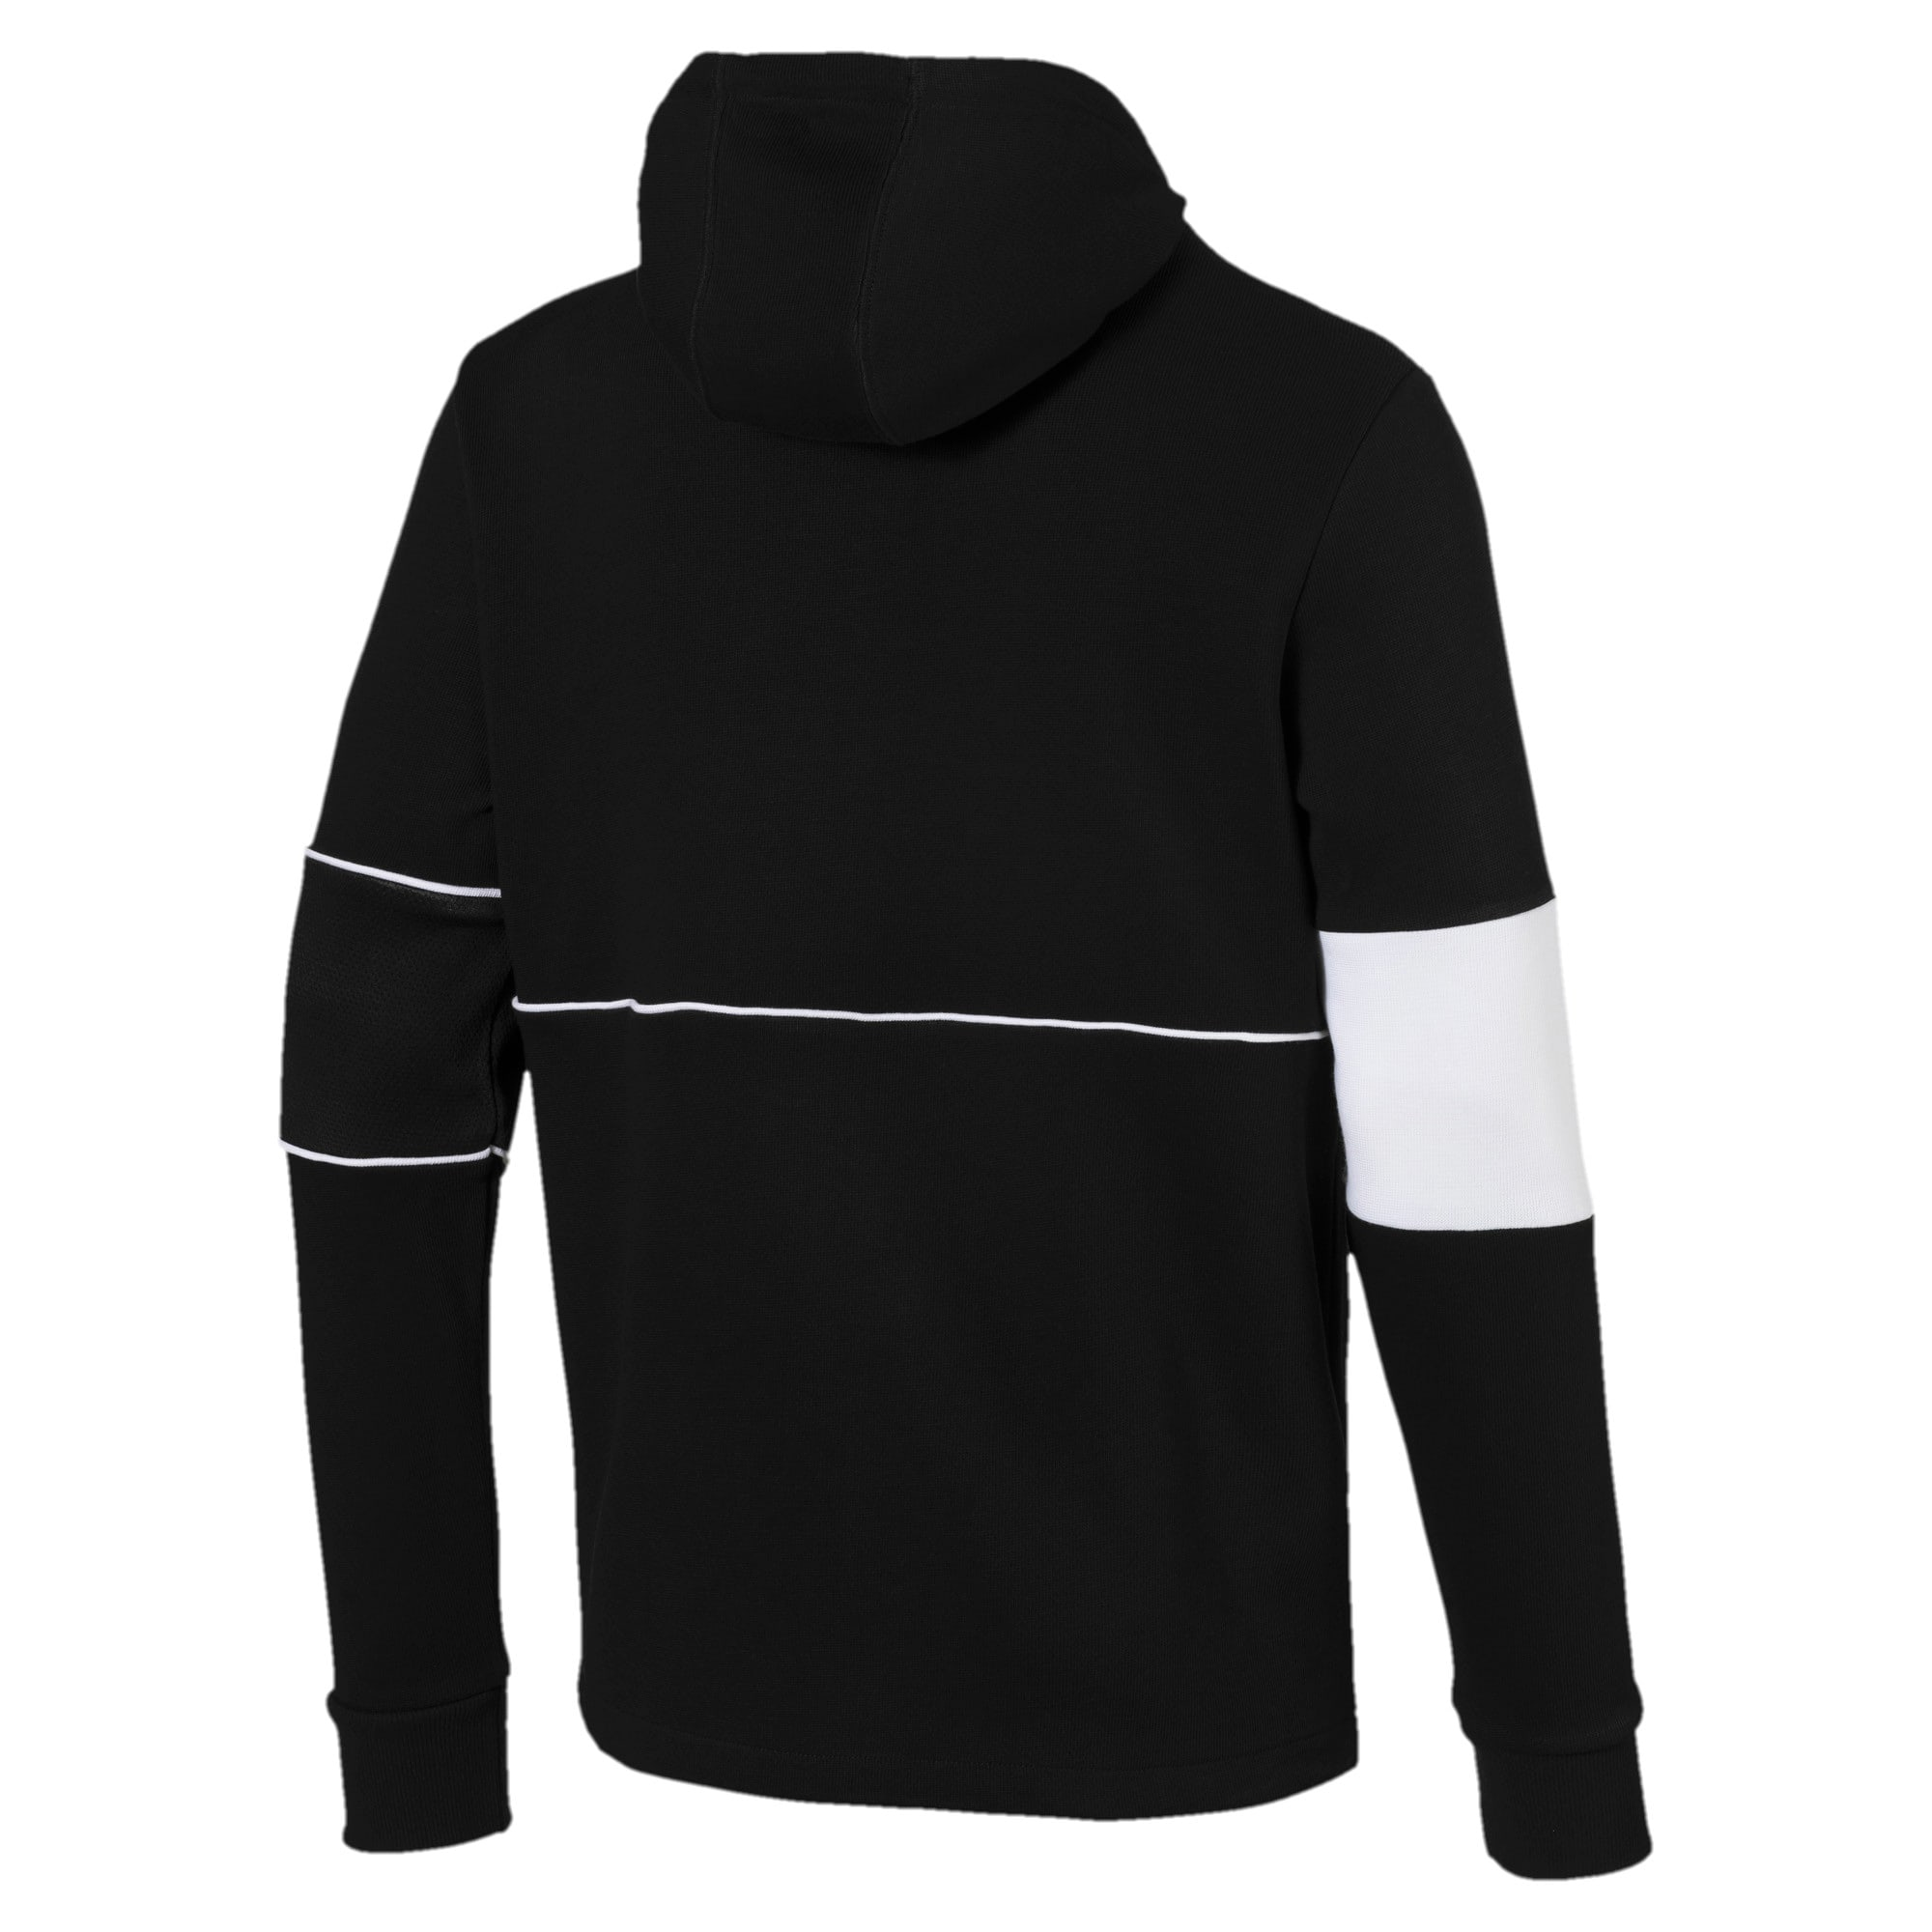 Thumbnail 5 of Scuderia Ferrari Men's Hooded Sweat Jacket, Puma Black, medium